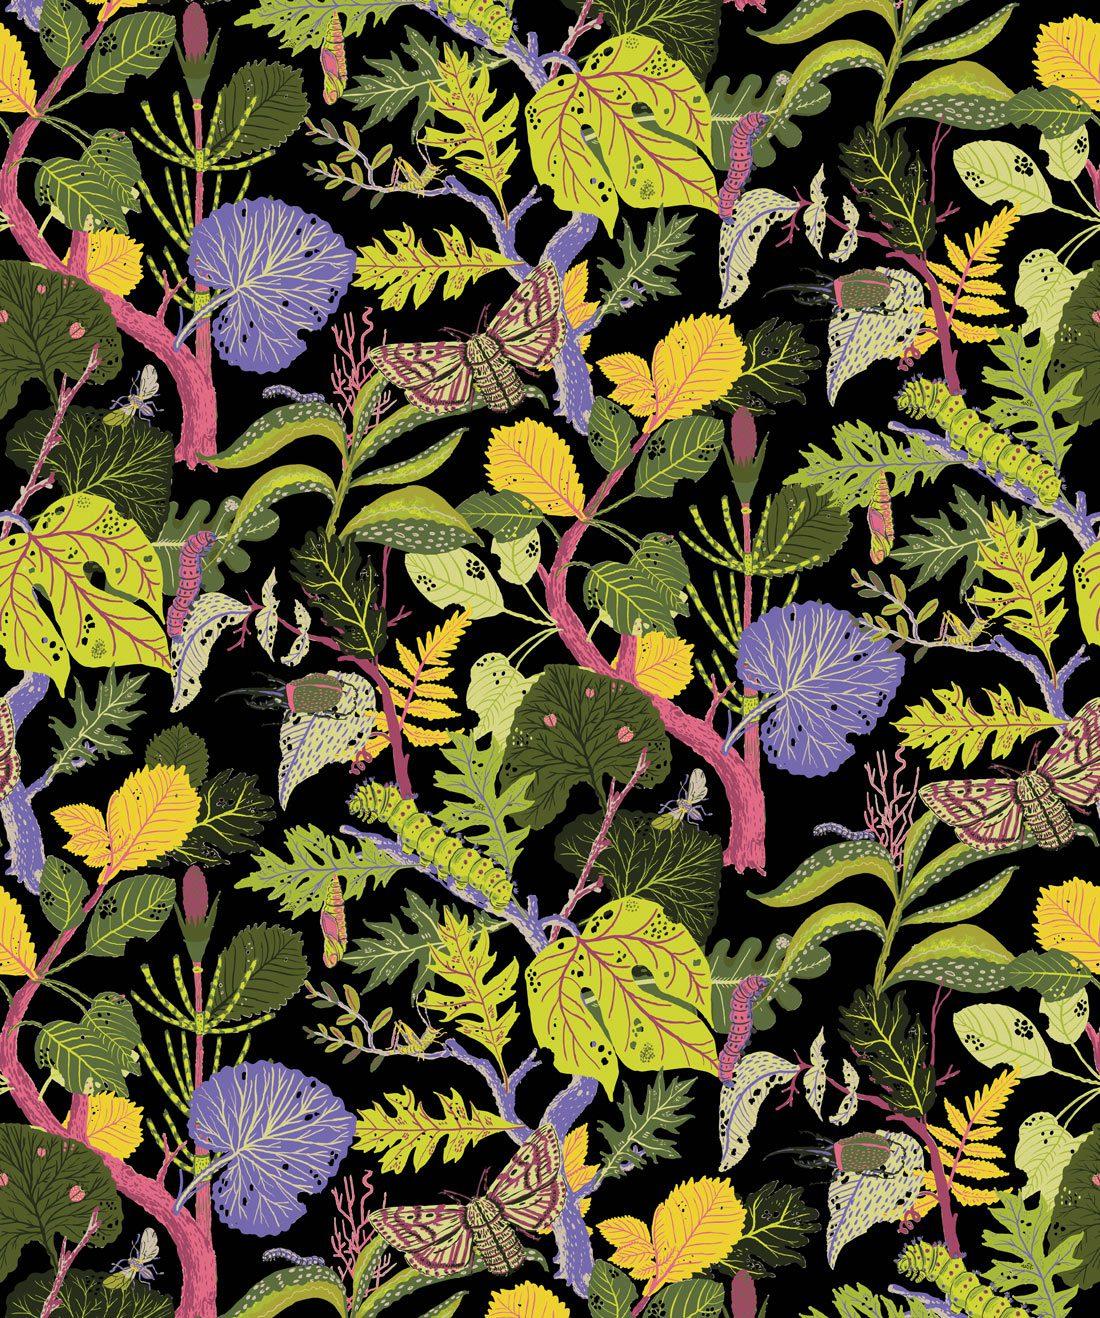 Caterpillar Lively Botanical Wallpaper Bold Fun Milton King 1100x1318